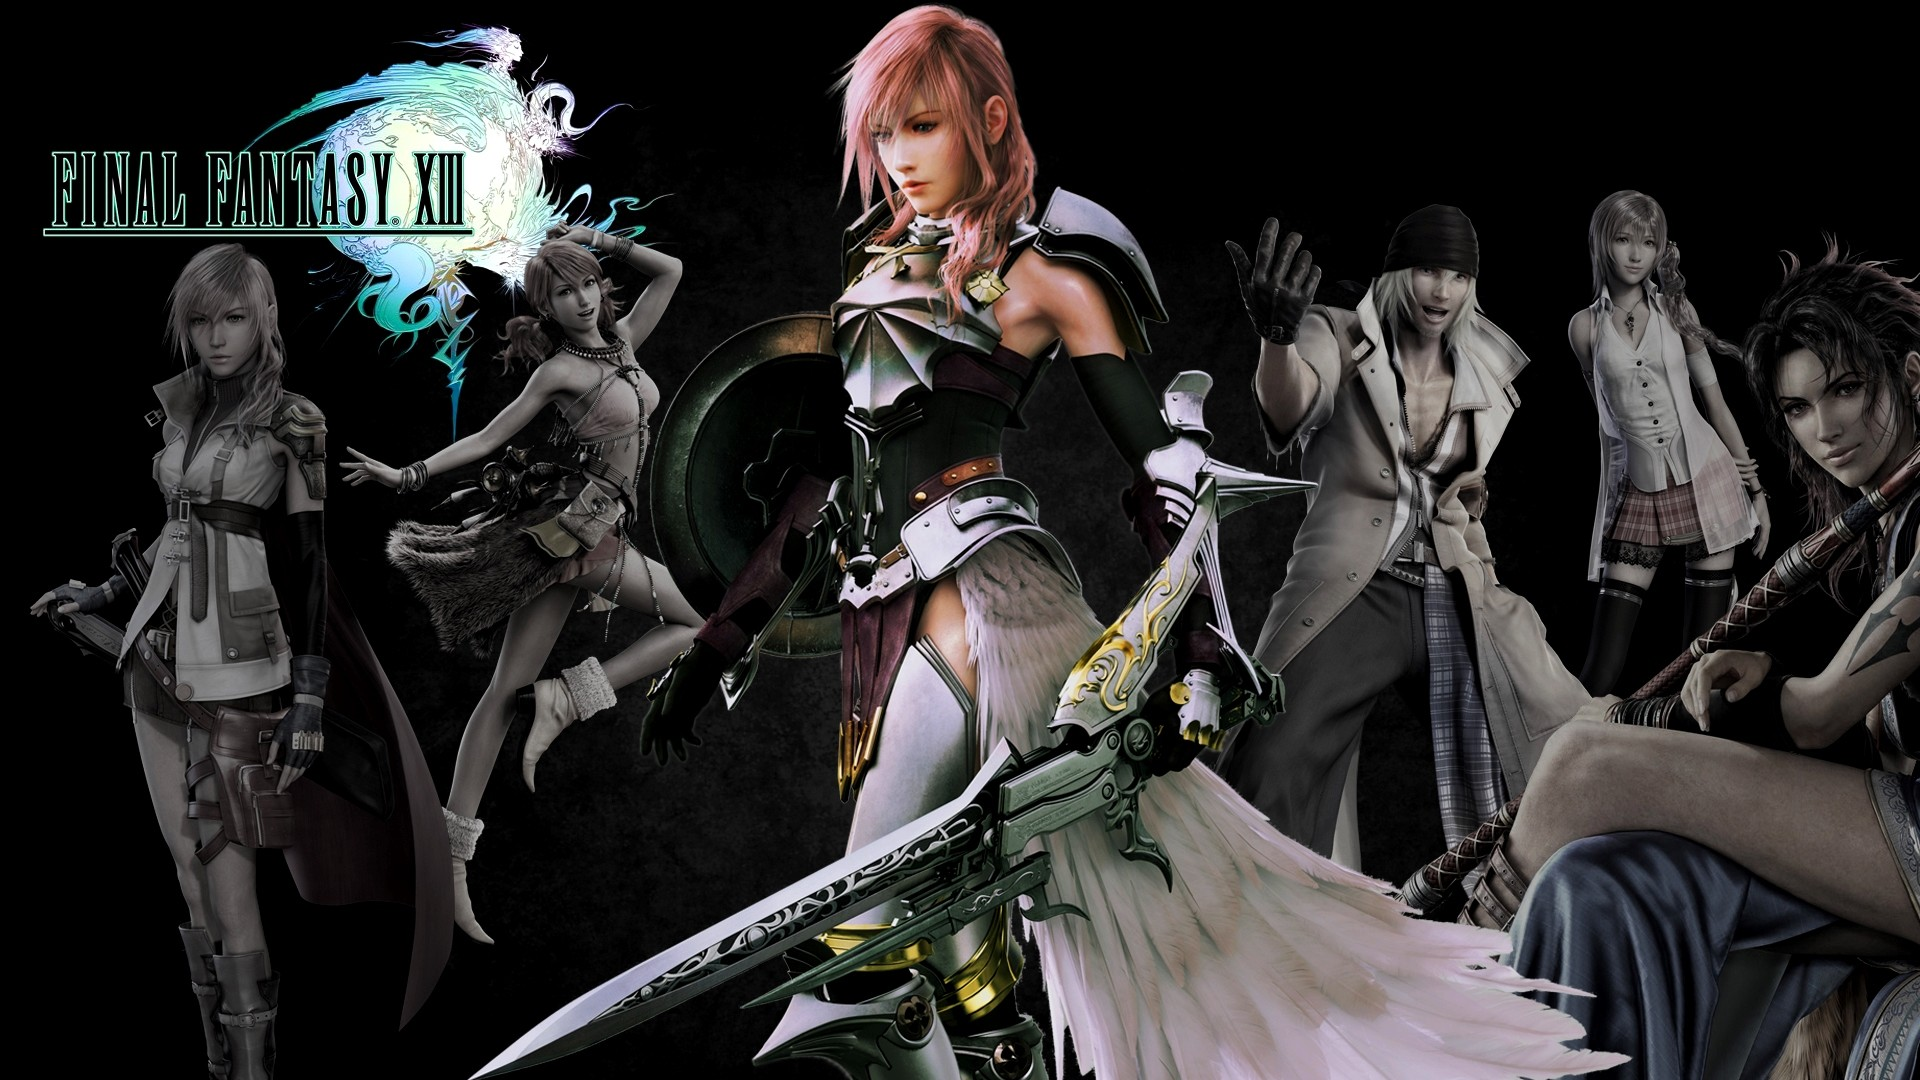 Final Fantasy 13 2 Wallpaper 79 Images